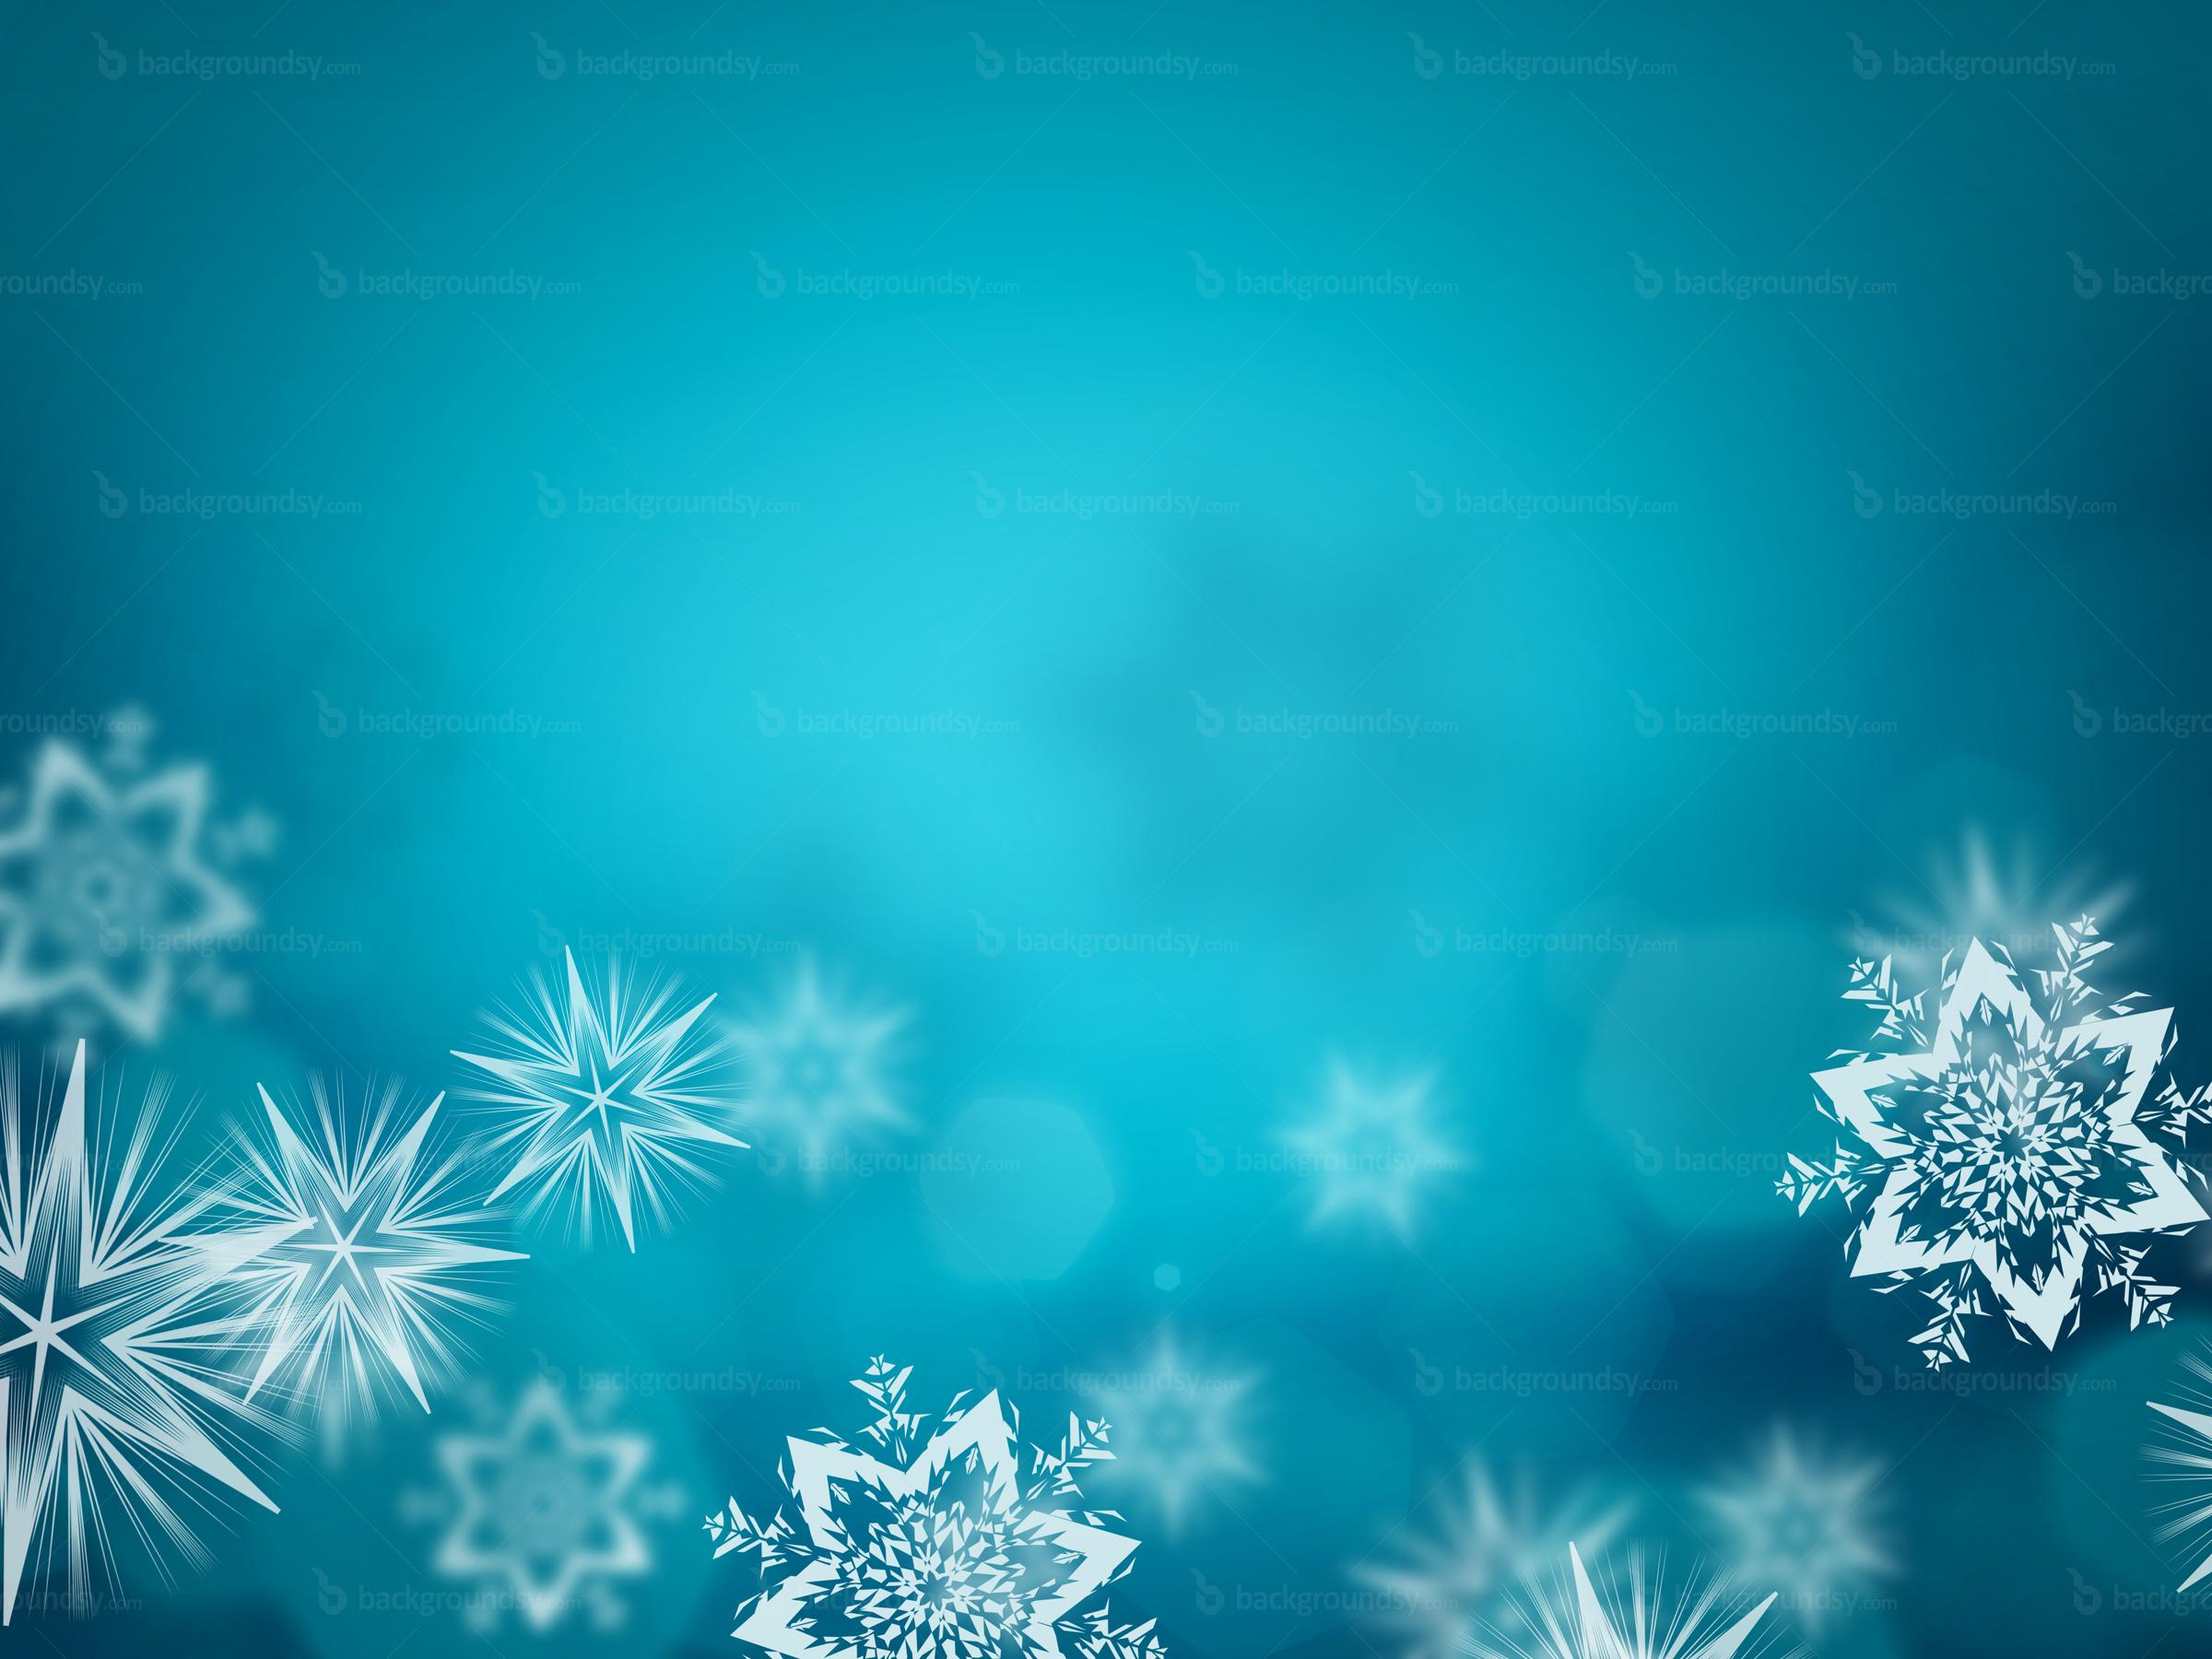 Background Winter - WallpaperSafari